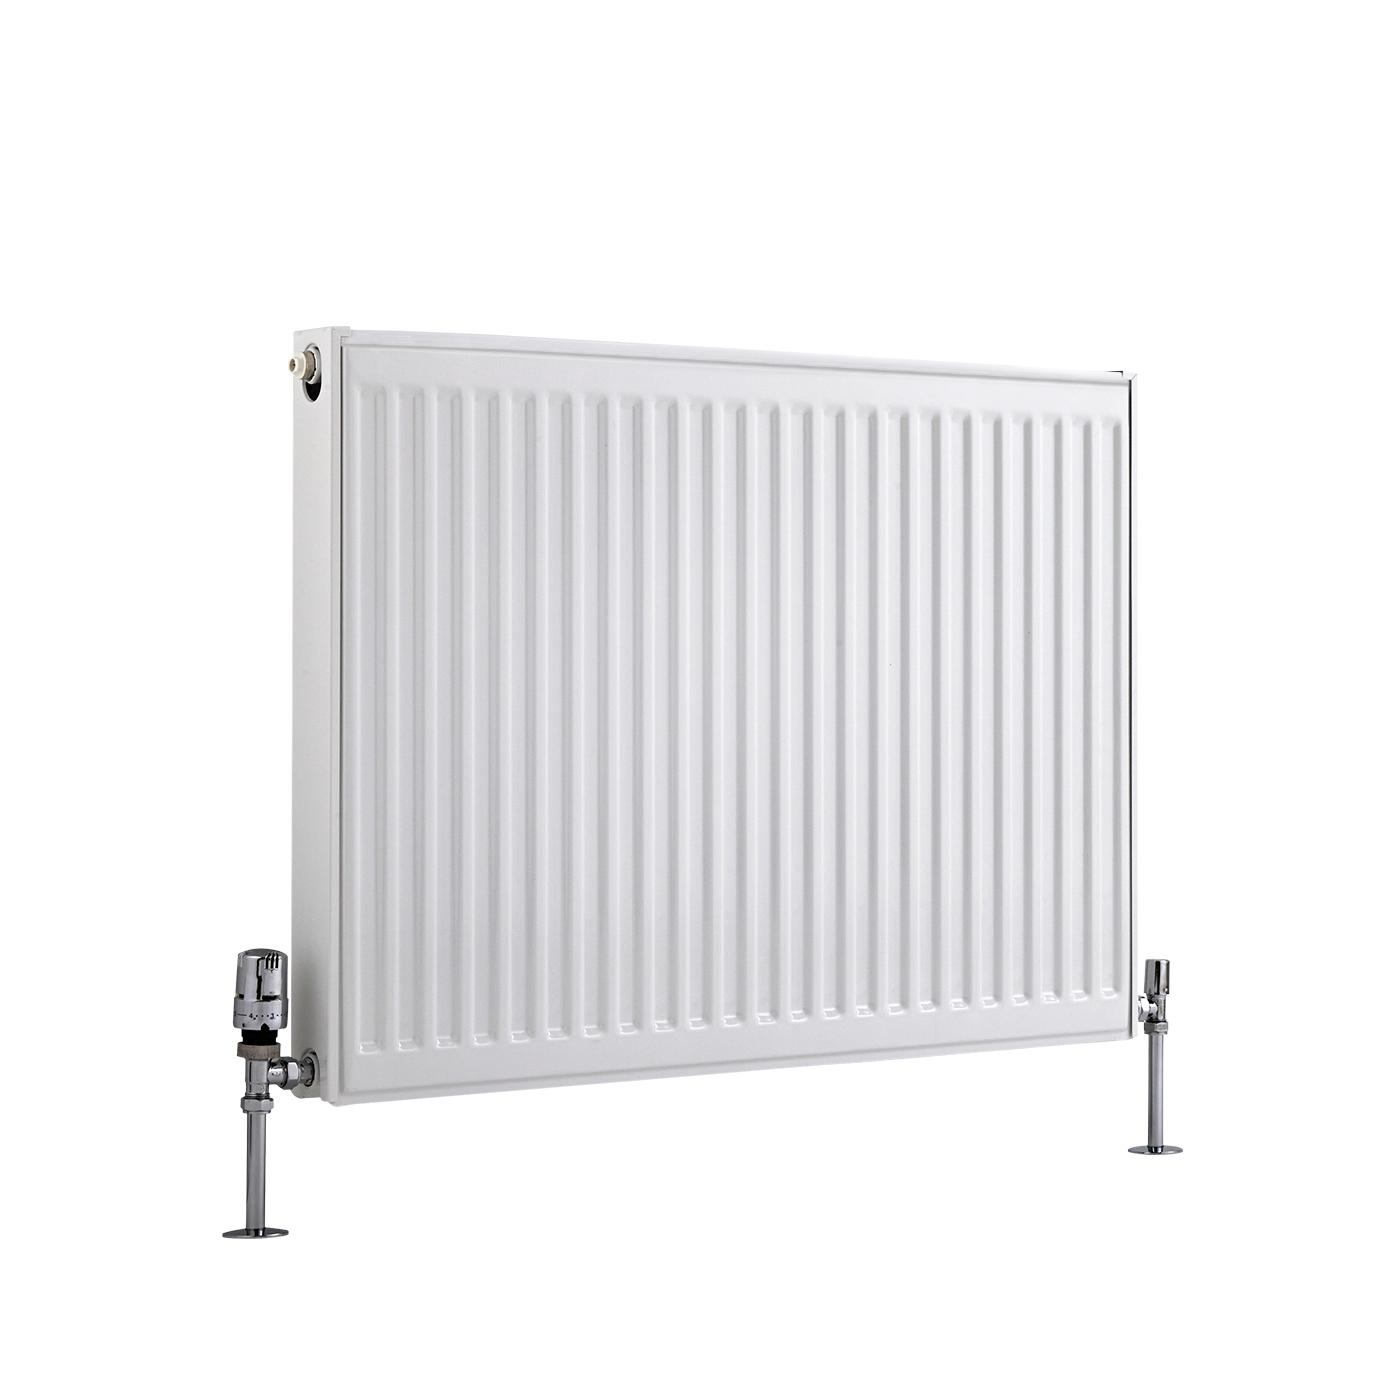 Radiateur À Panneaux Type 21 Horizontal Blanc Eco 60cm x 80cm x 7,3cm 1071 Watts